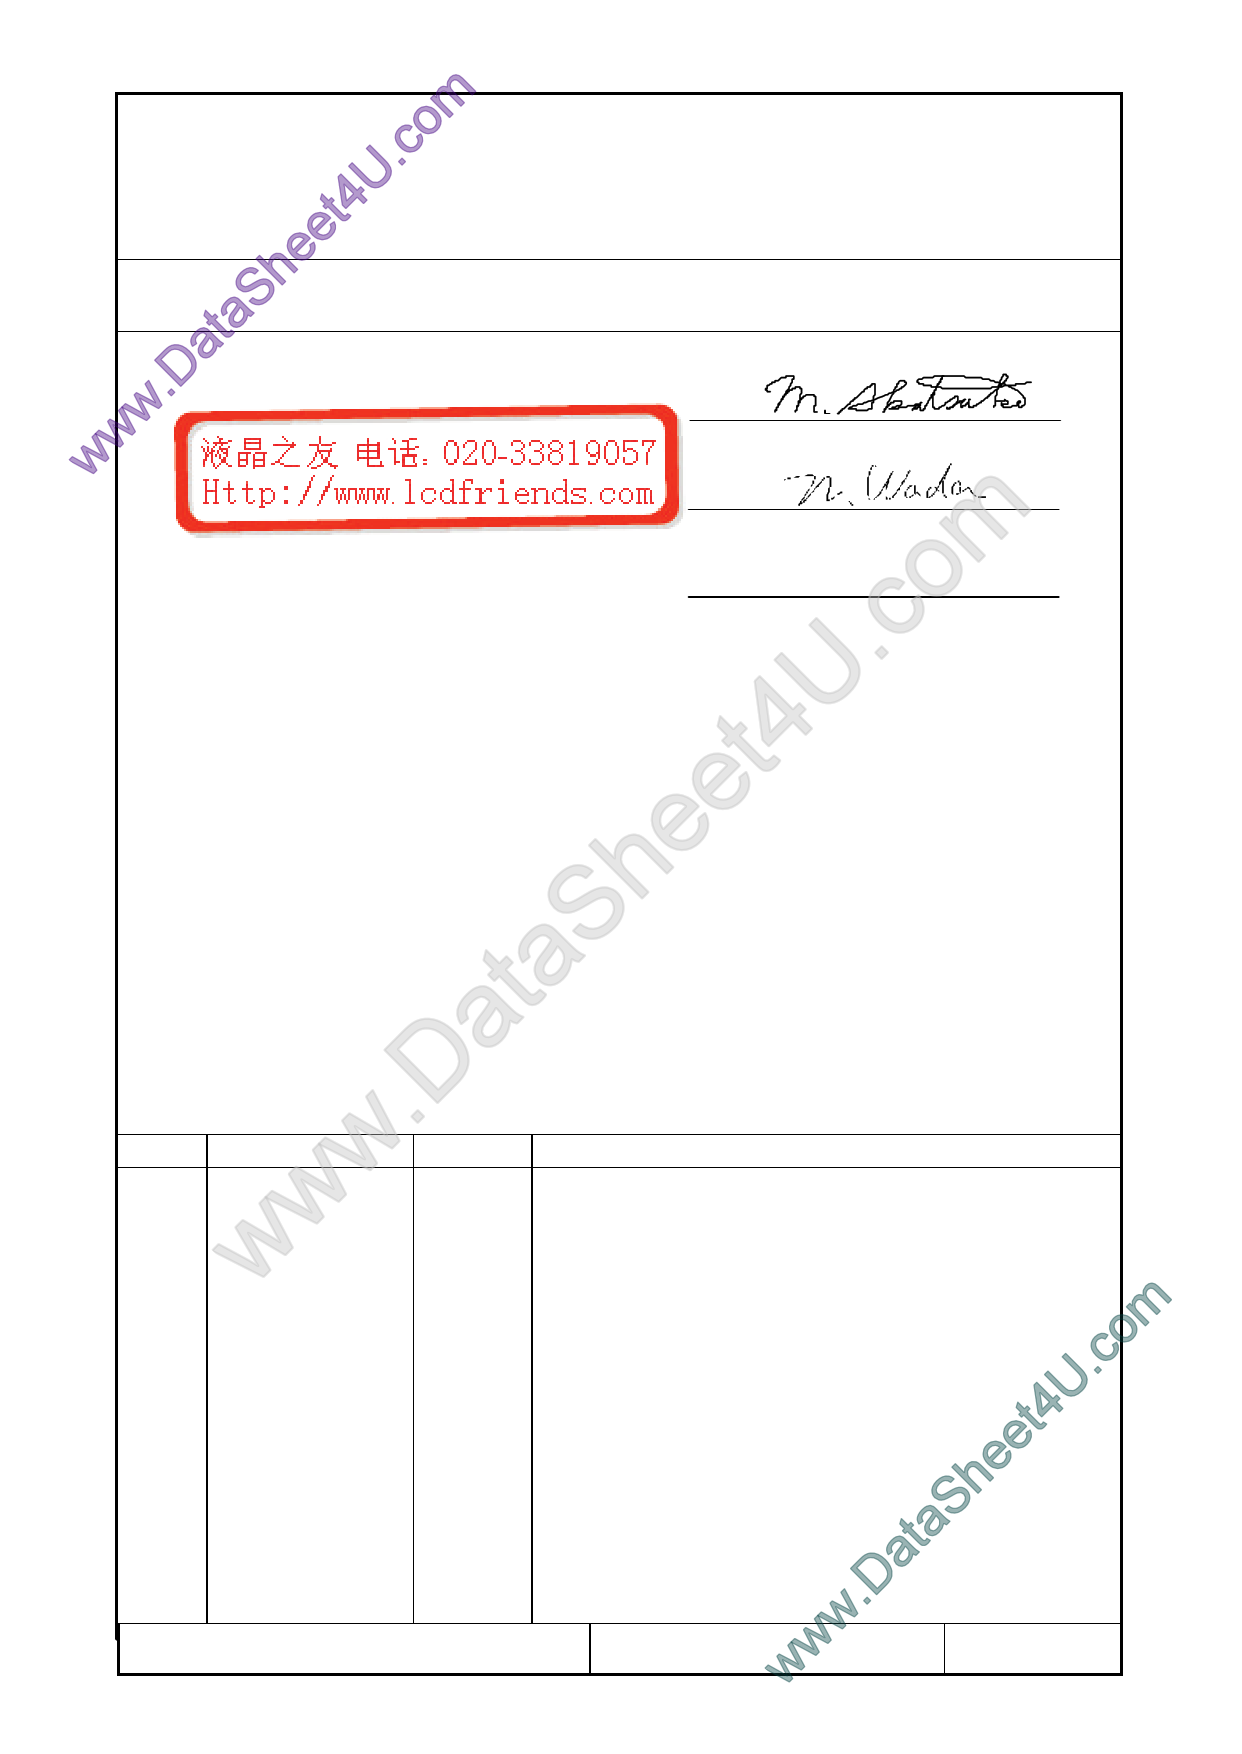 F-51852GNFQJ-LG-ACN Hoja de datos, Descripción, Manual